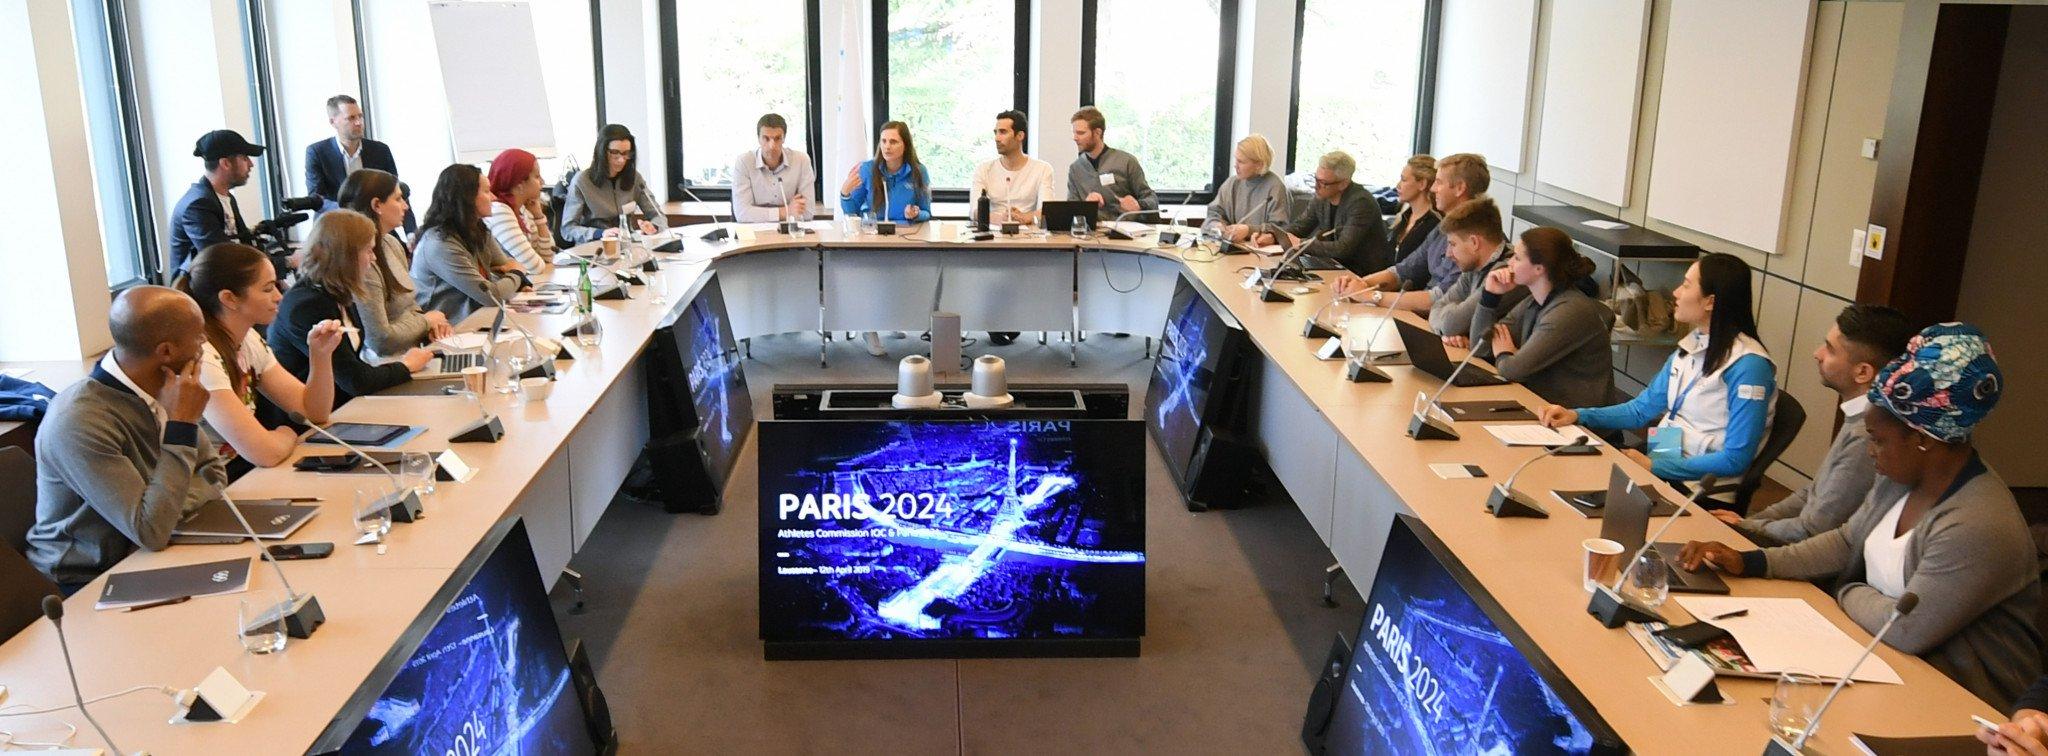 Paris+2024.jpg